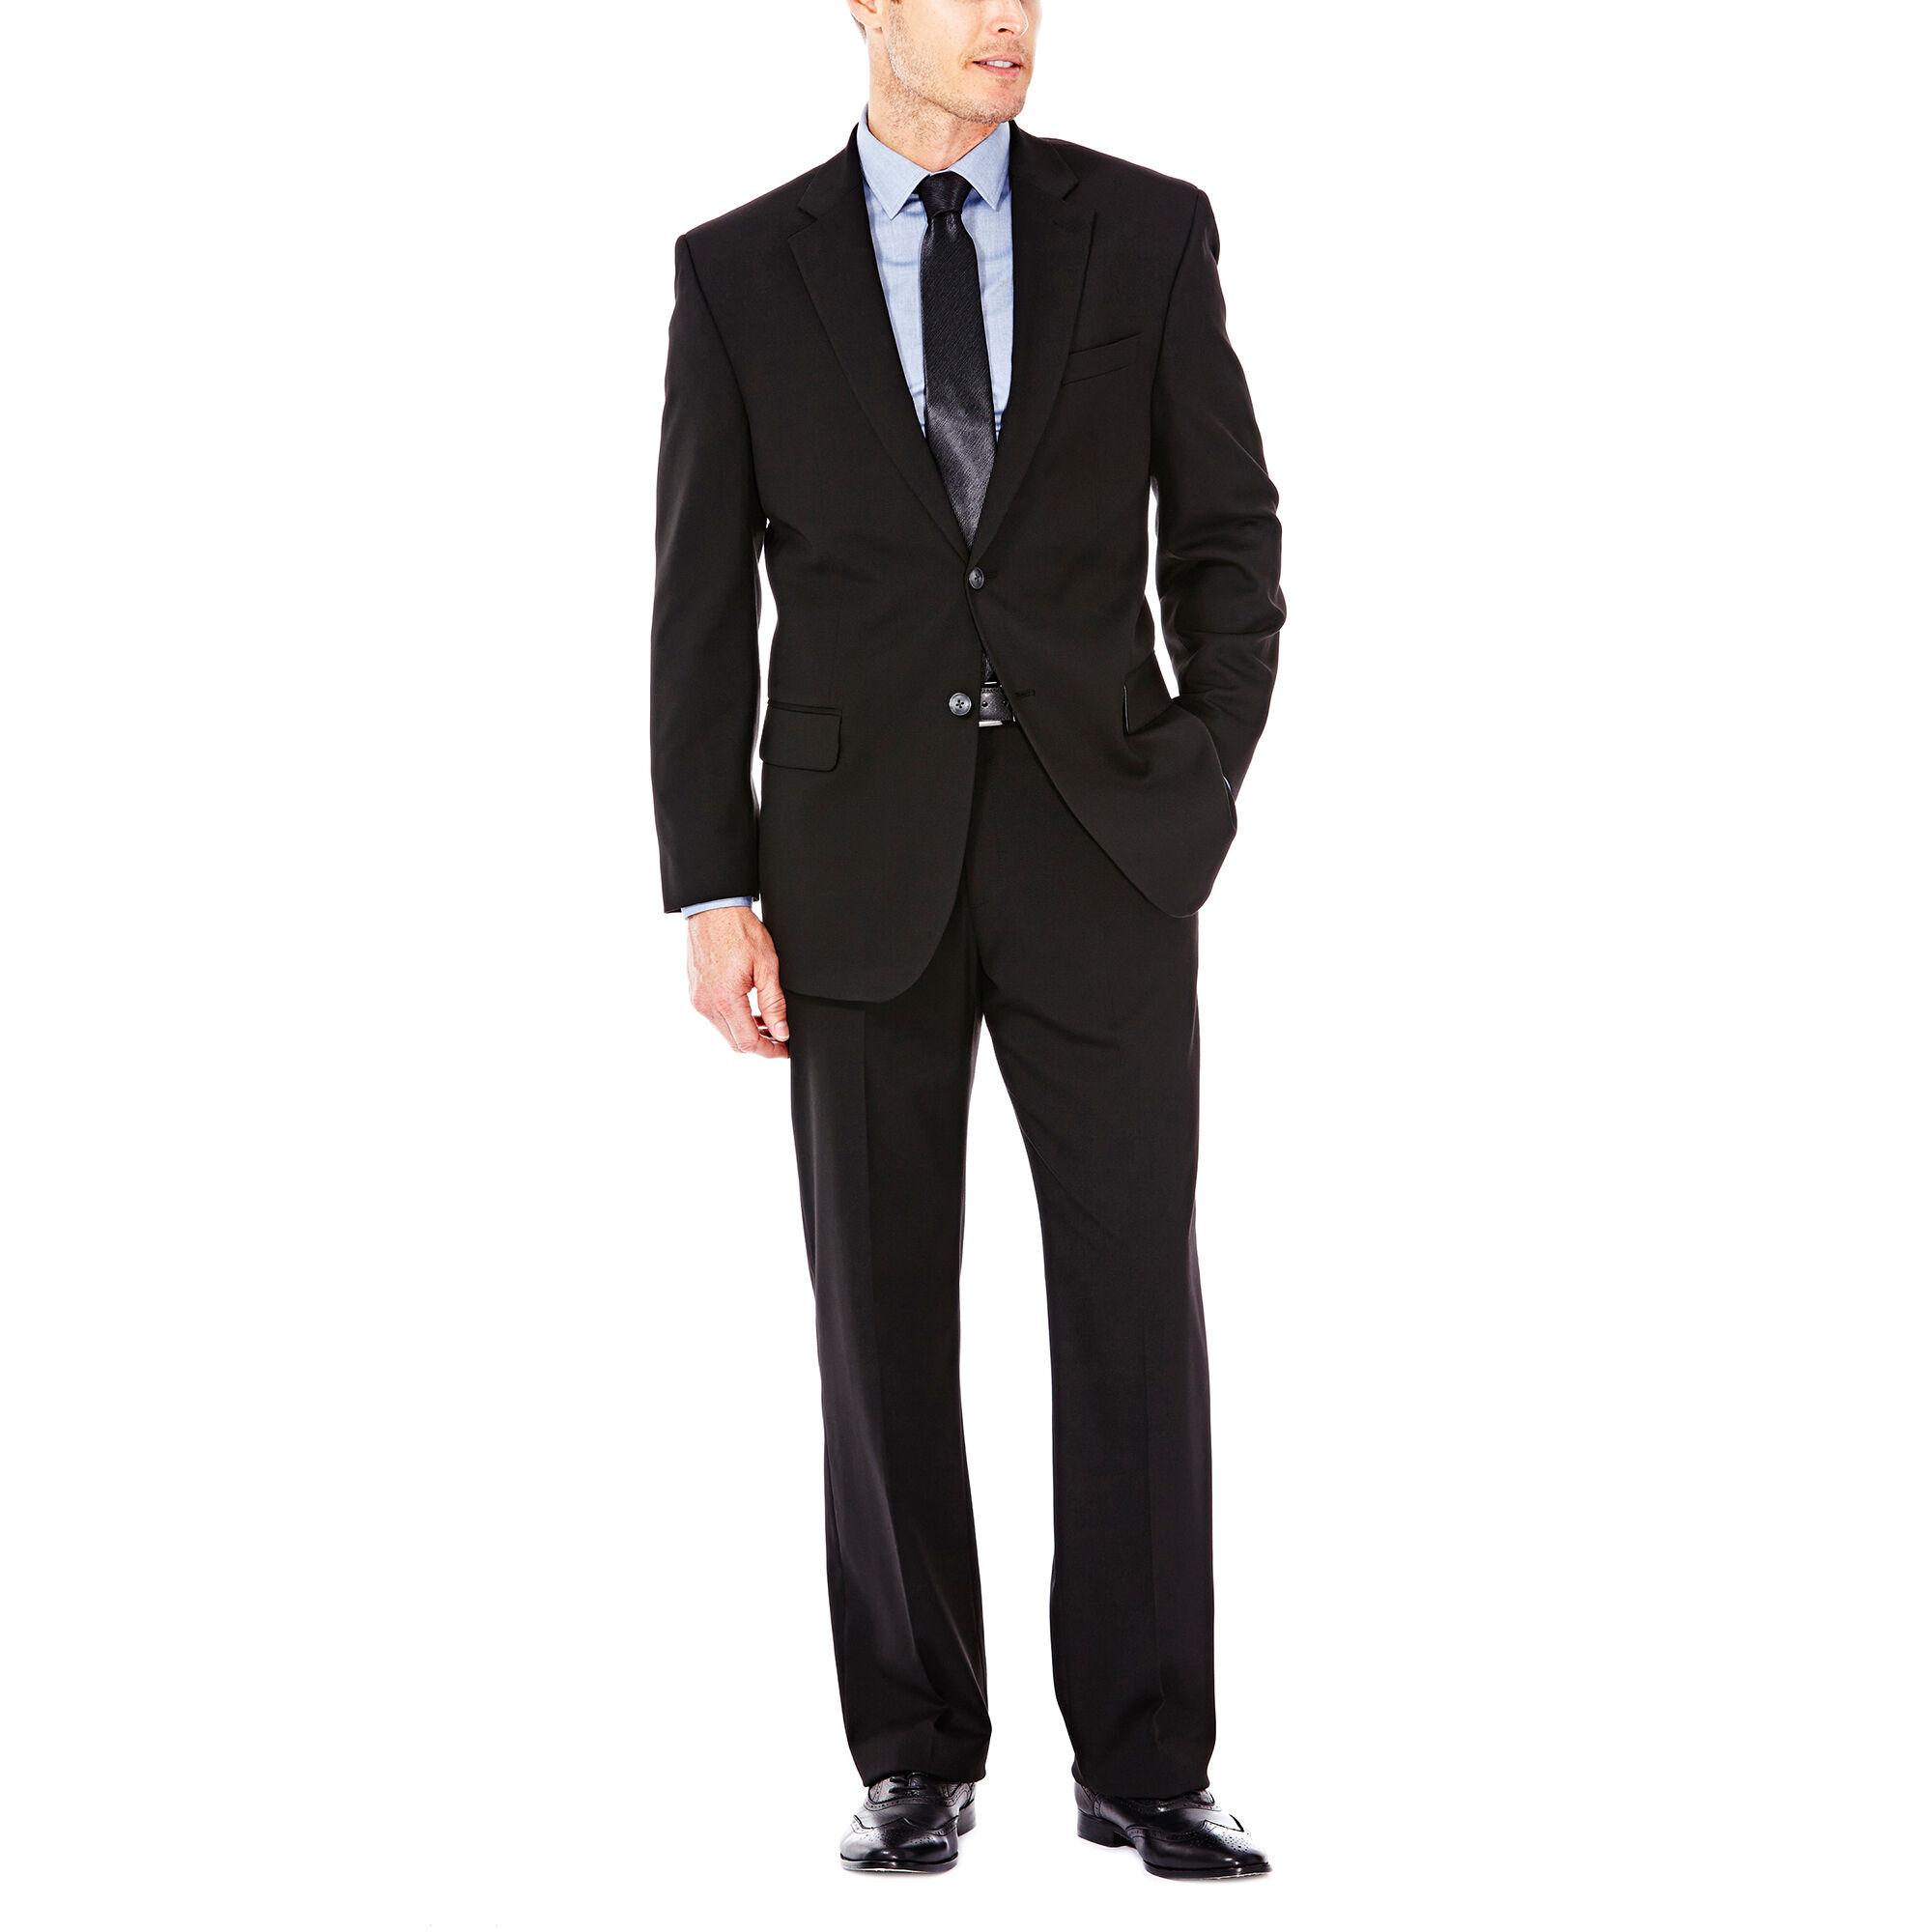 a9dad41c4b9 J.M. Haggar Premium Stretch Suit Jacket, Black, hi-res. J.M. Haggar Premium  Stretch Suit Pant - Flat Front ...